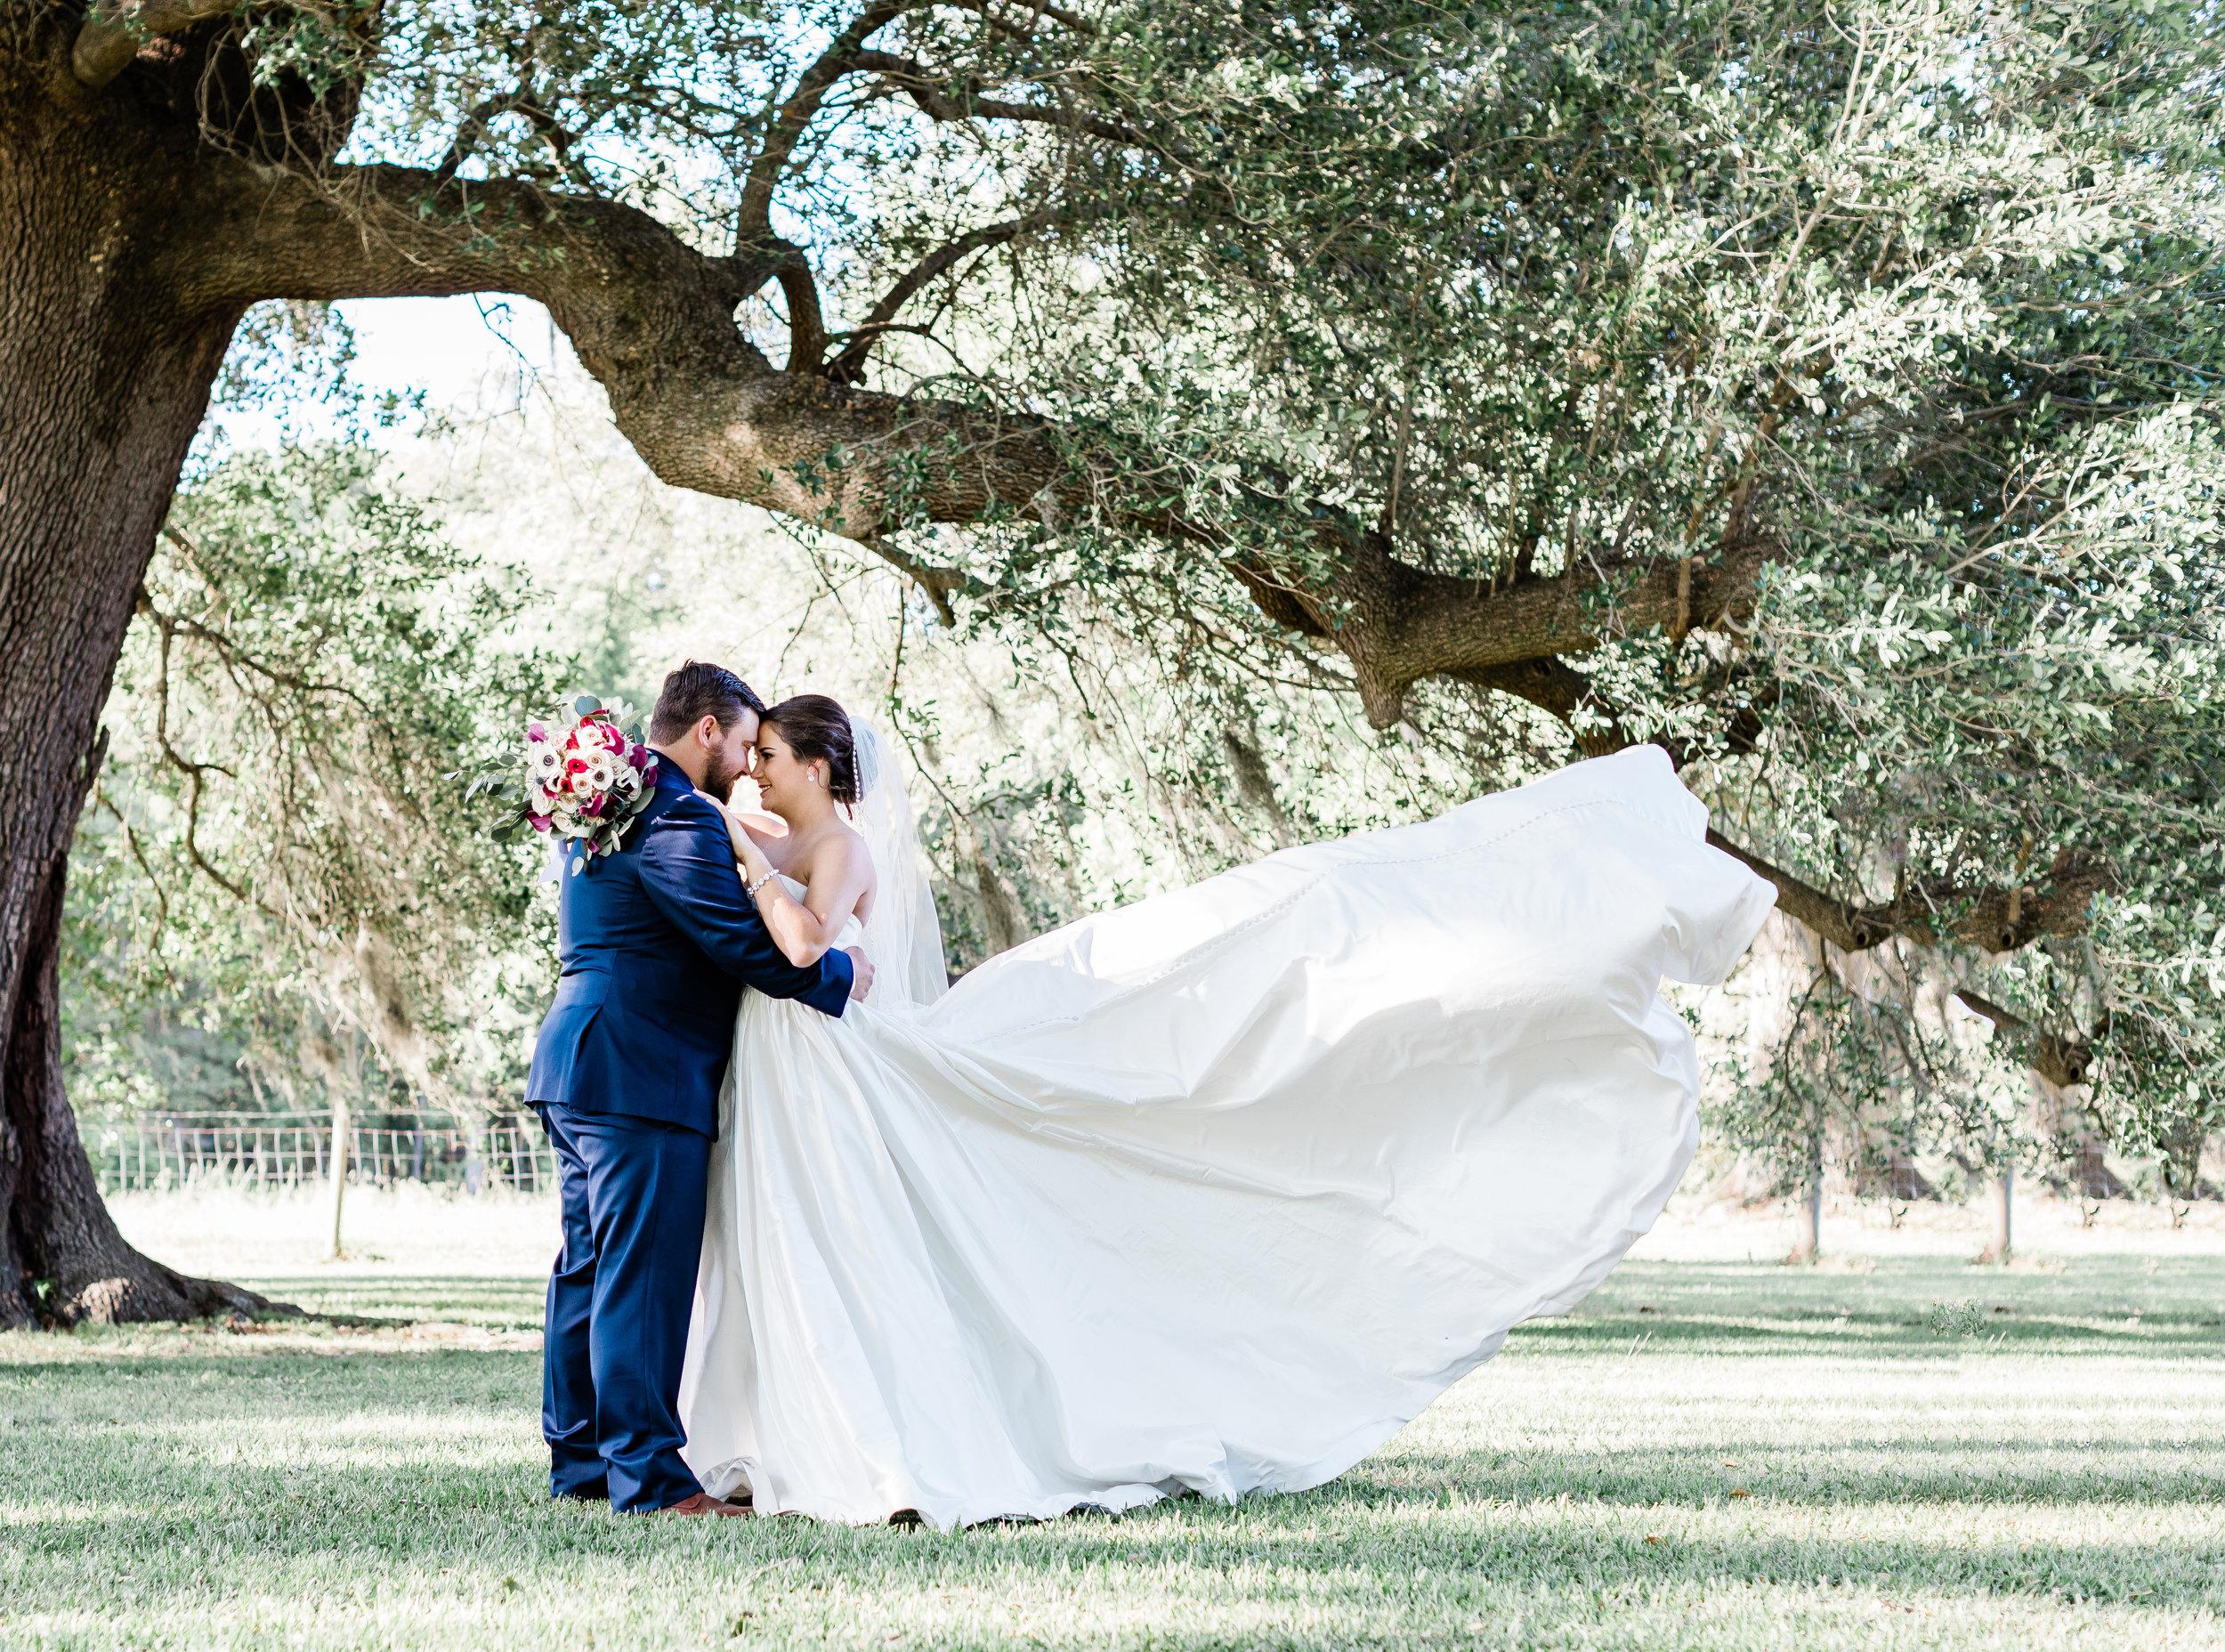 20190427-Southern Lens Photography- Savannah Wedding Photographer-Screven and Caroline-201913.jpg